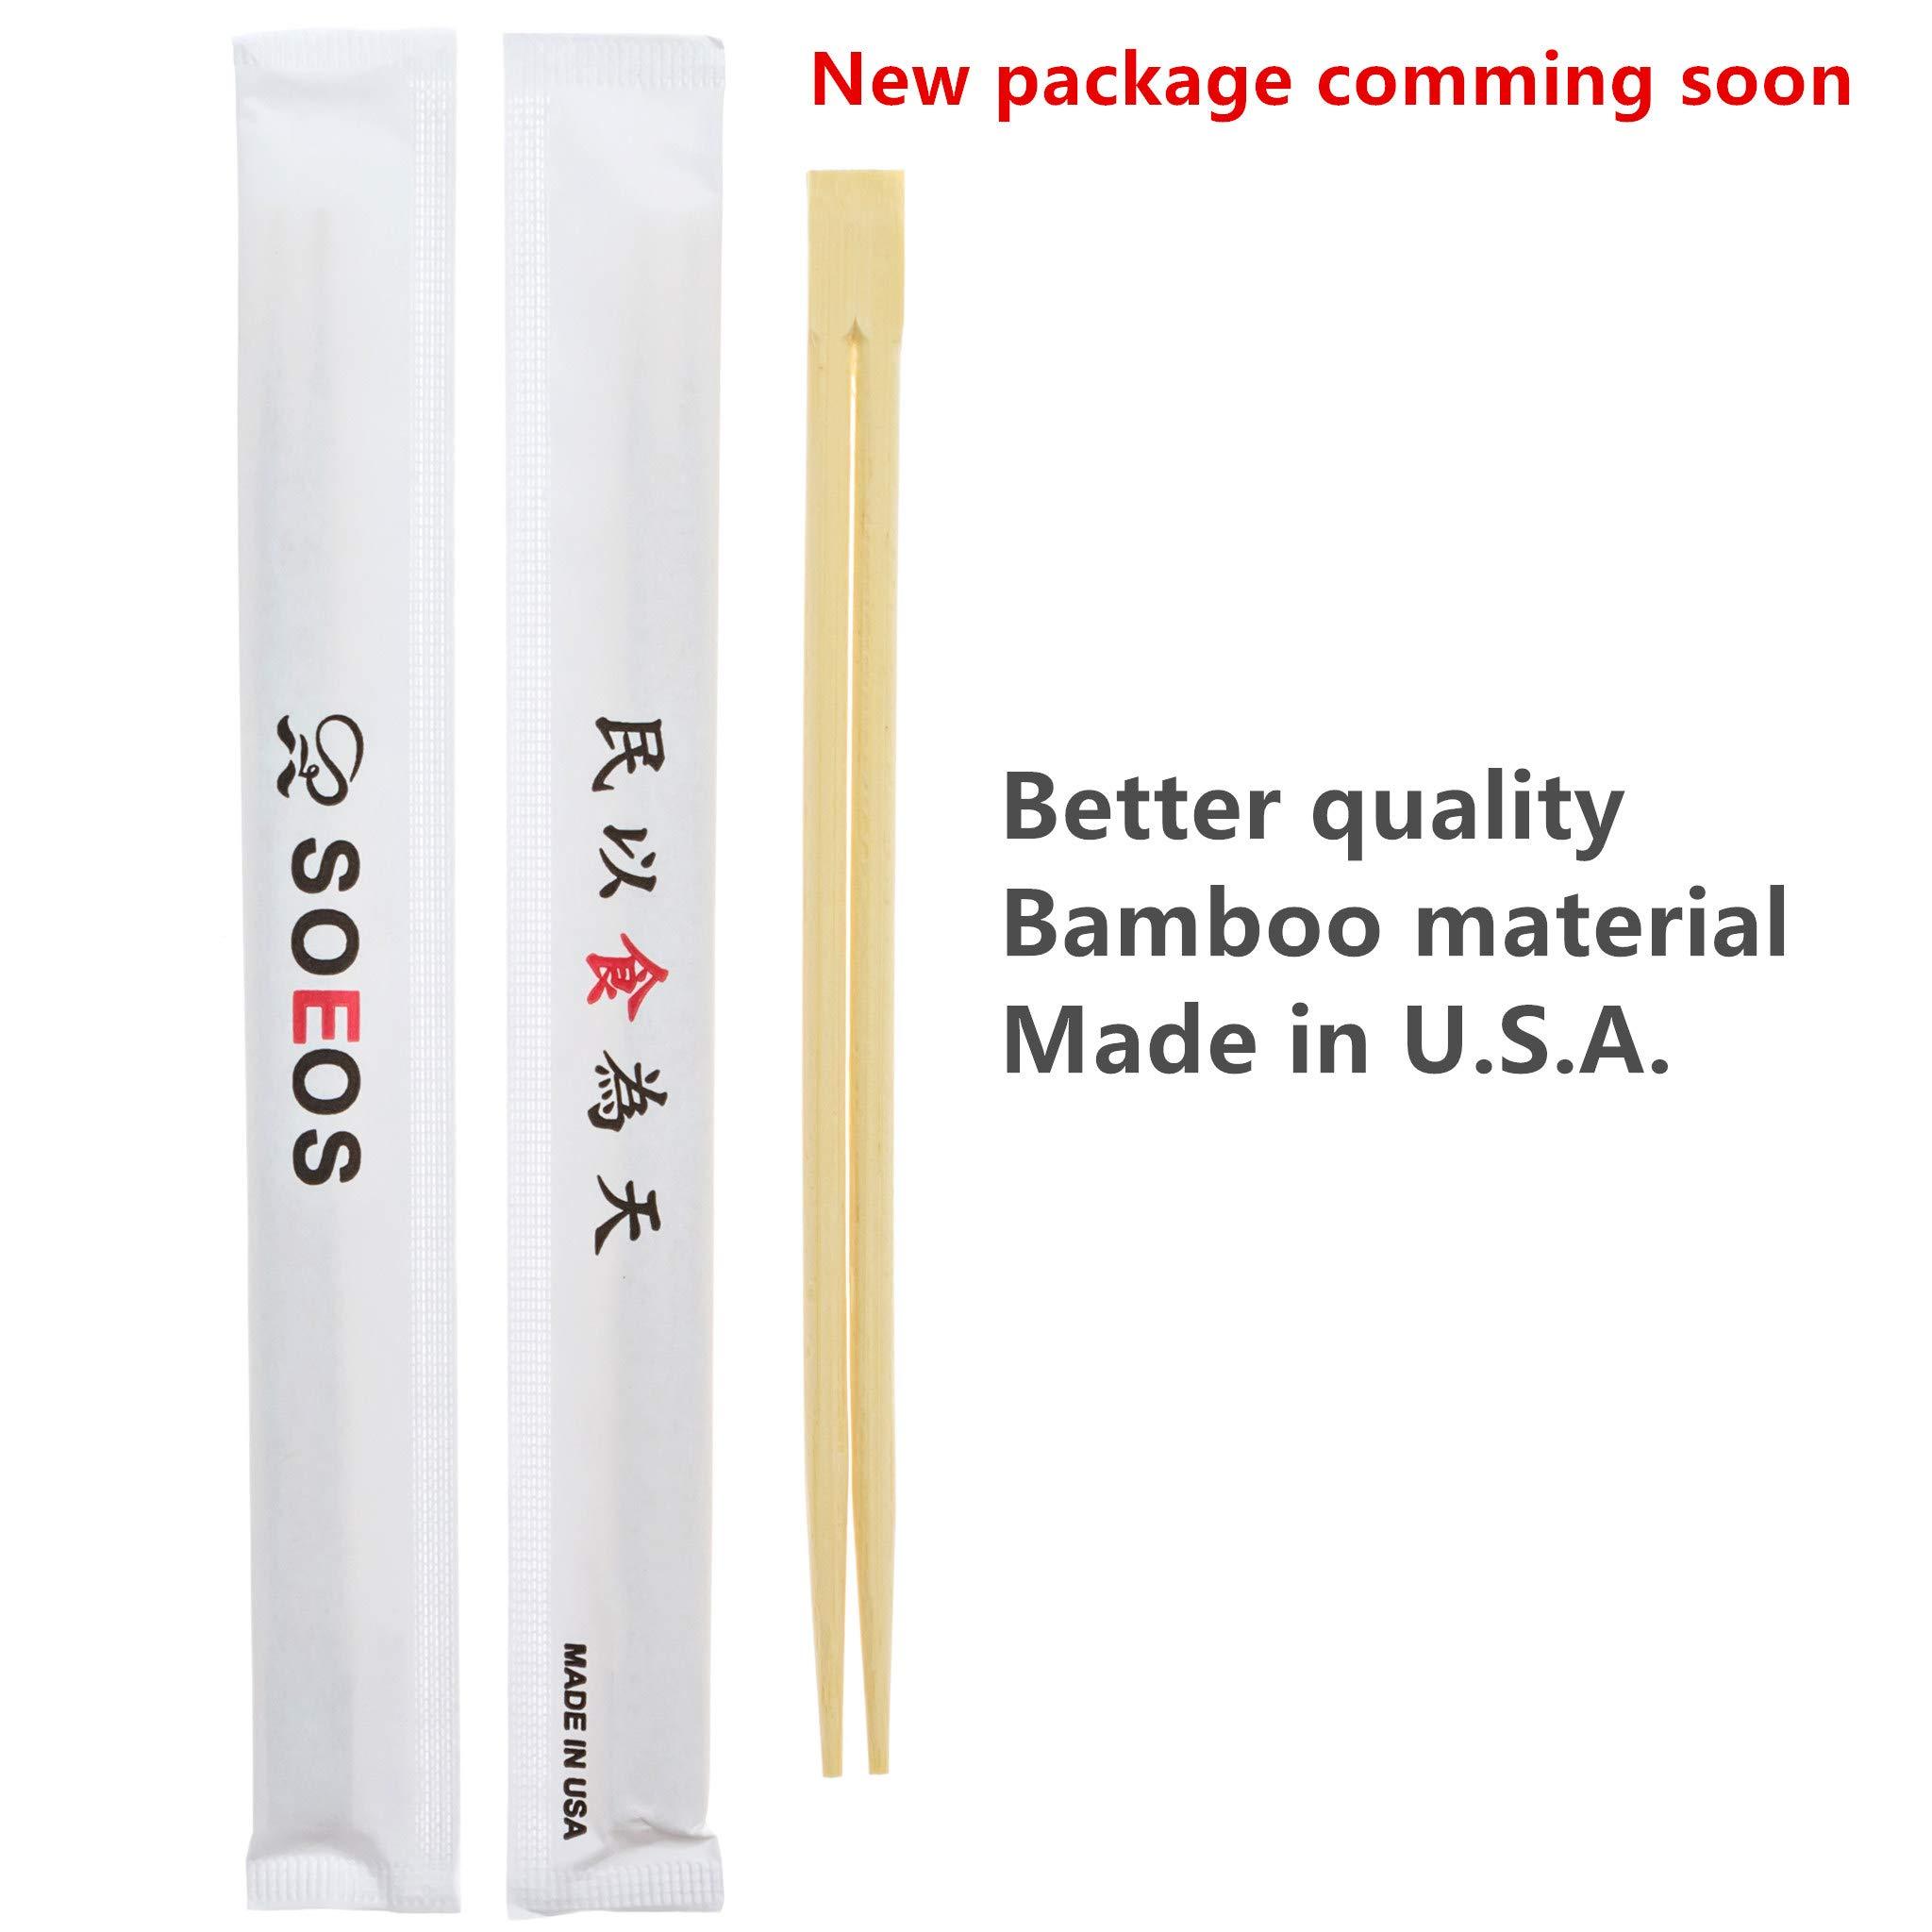 Premium Disposable Bamboo Chopsticks (500 sets), Japanese Disposable Chopsticks Bulk, 9'', Certified Quality by Soeos (Image #2)